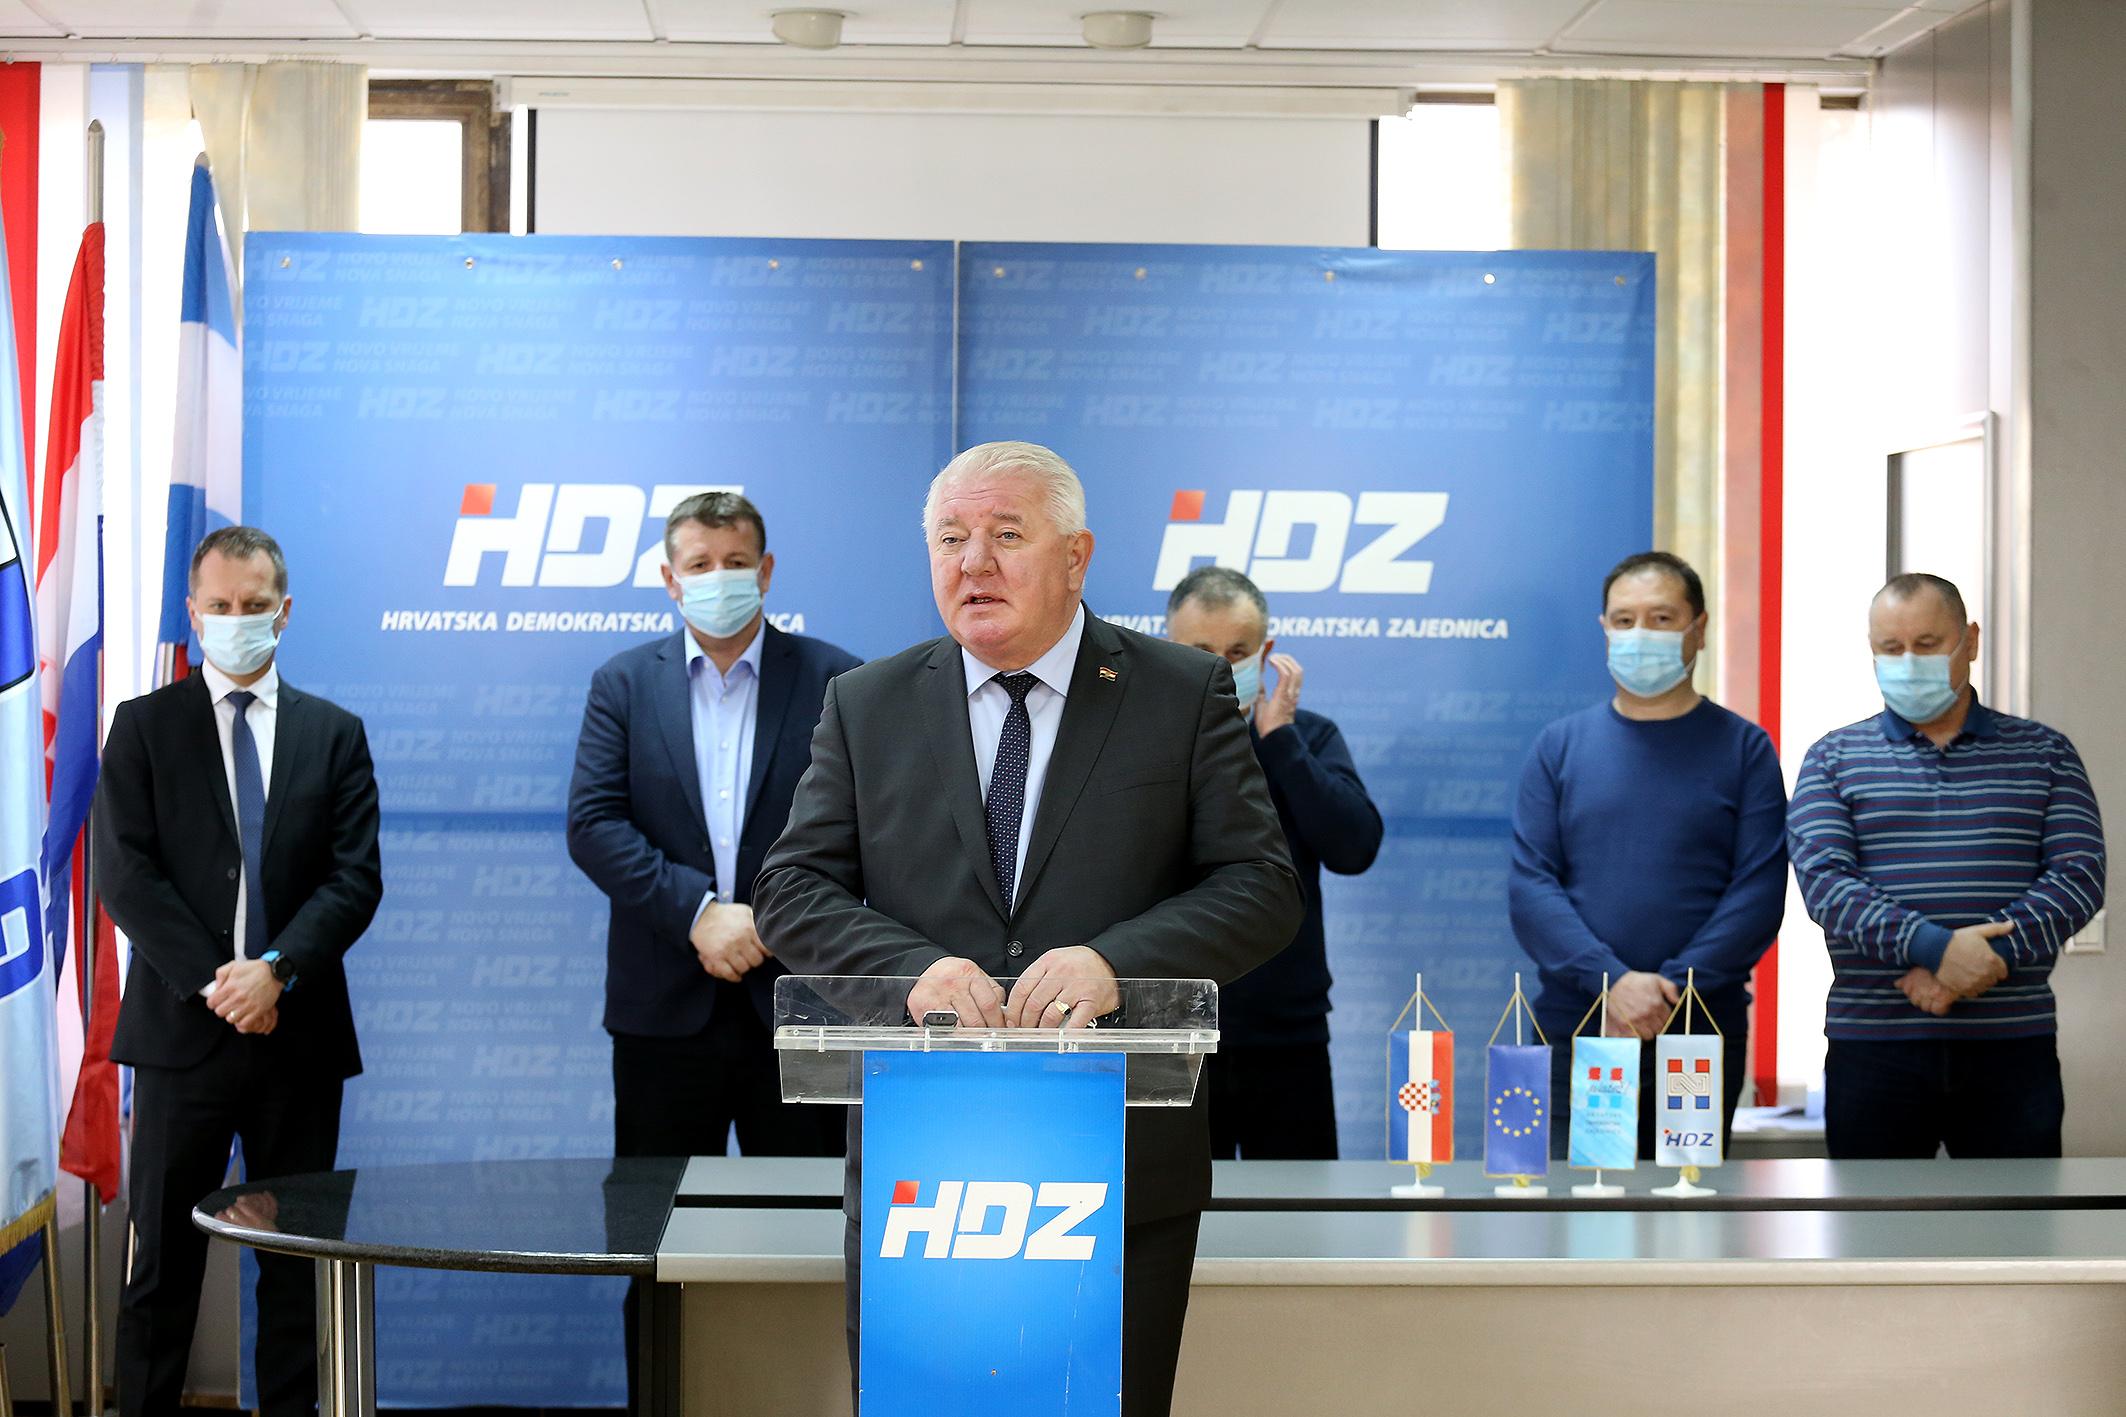 HDZ press (3)